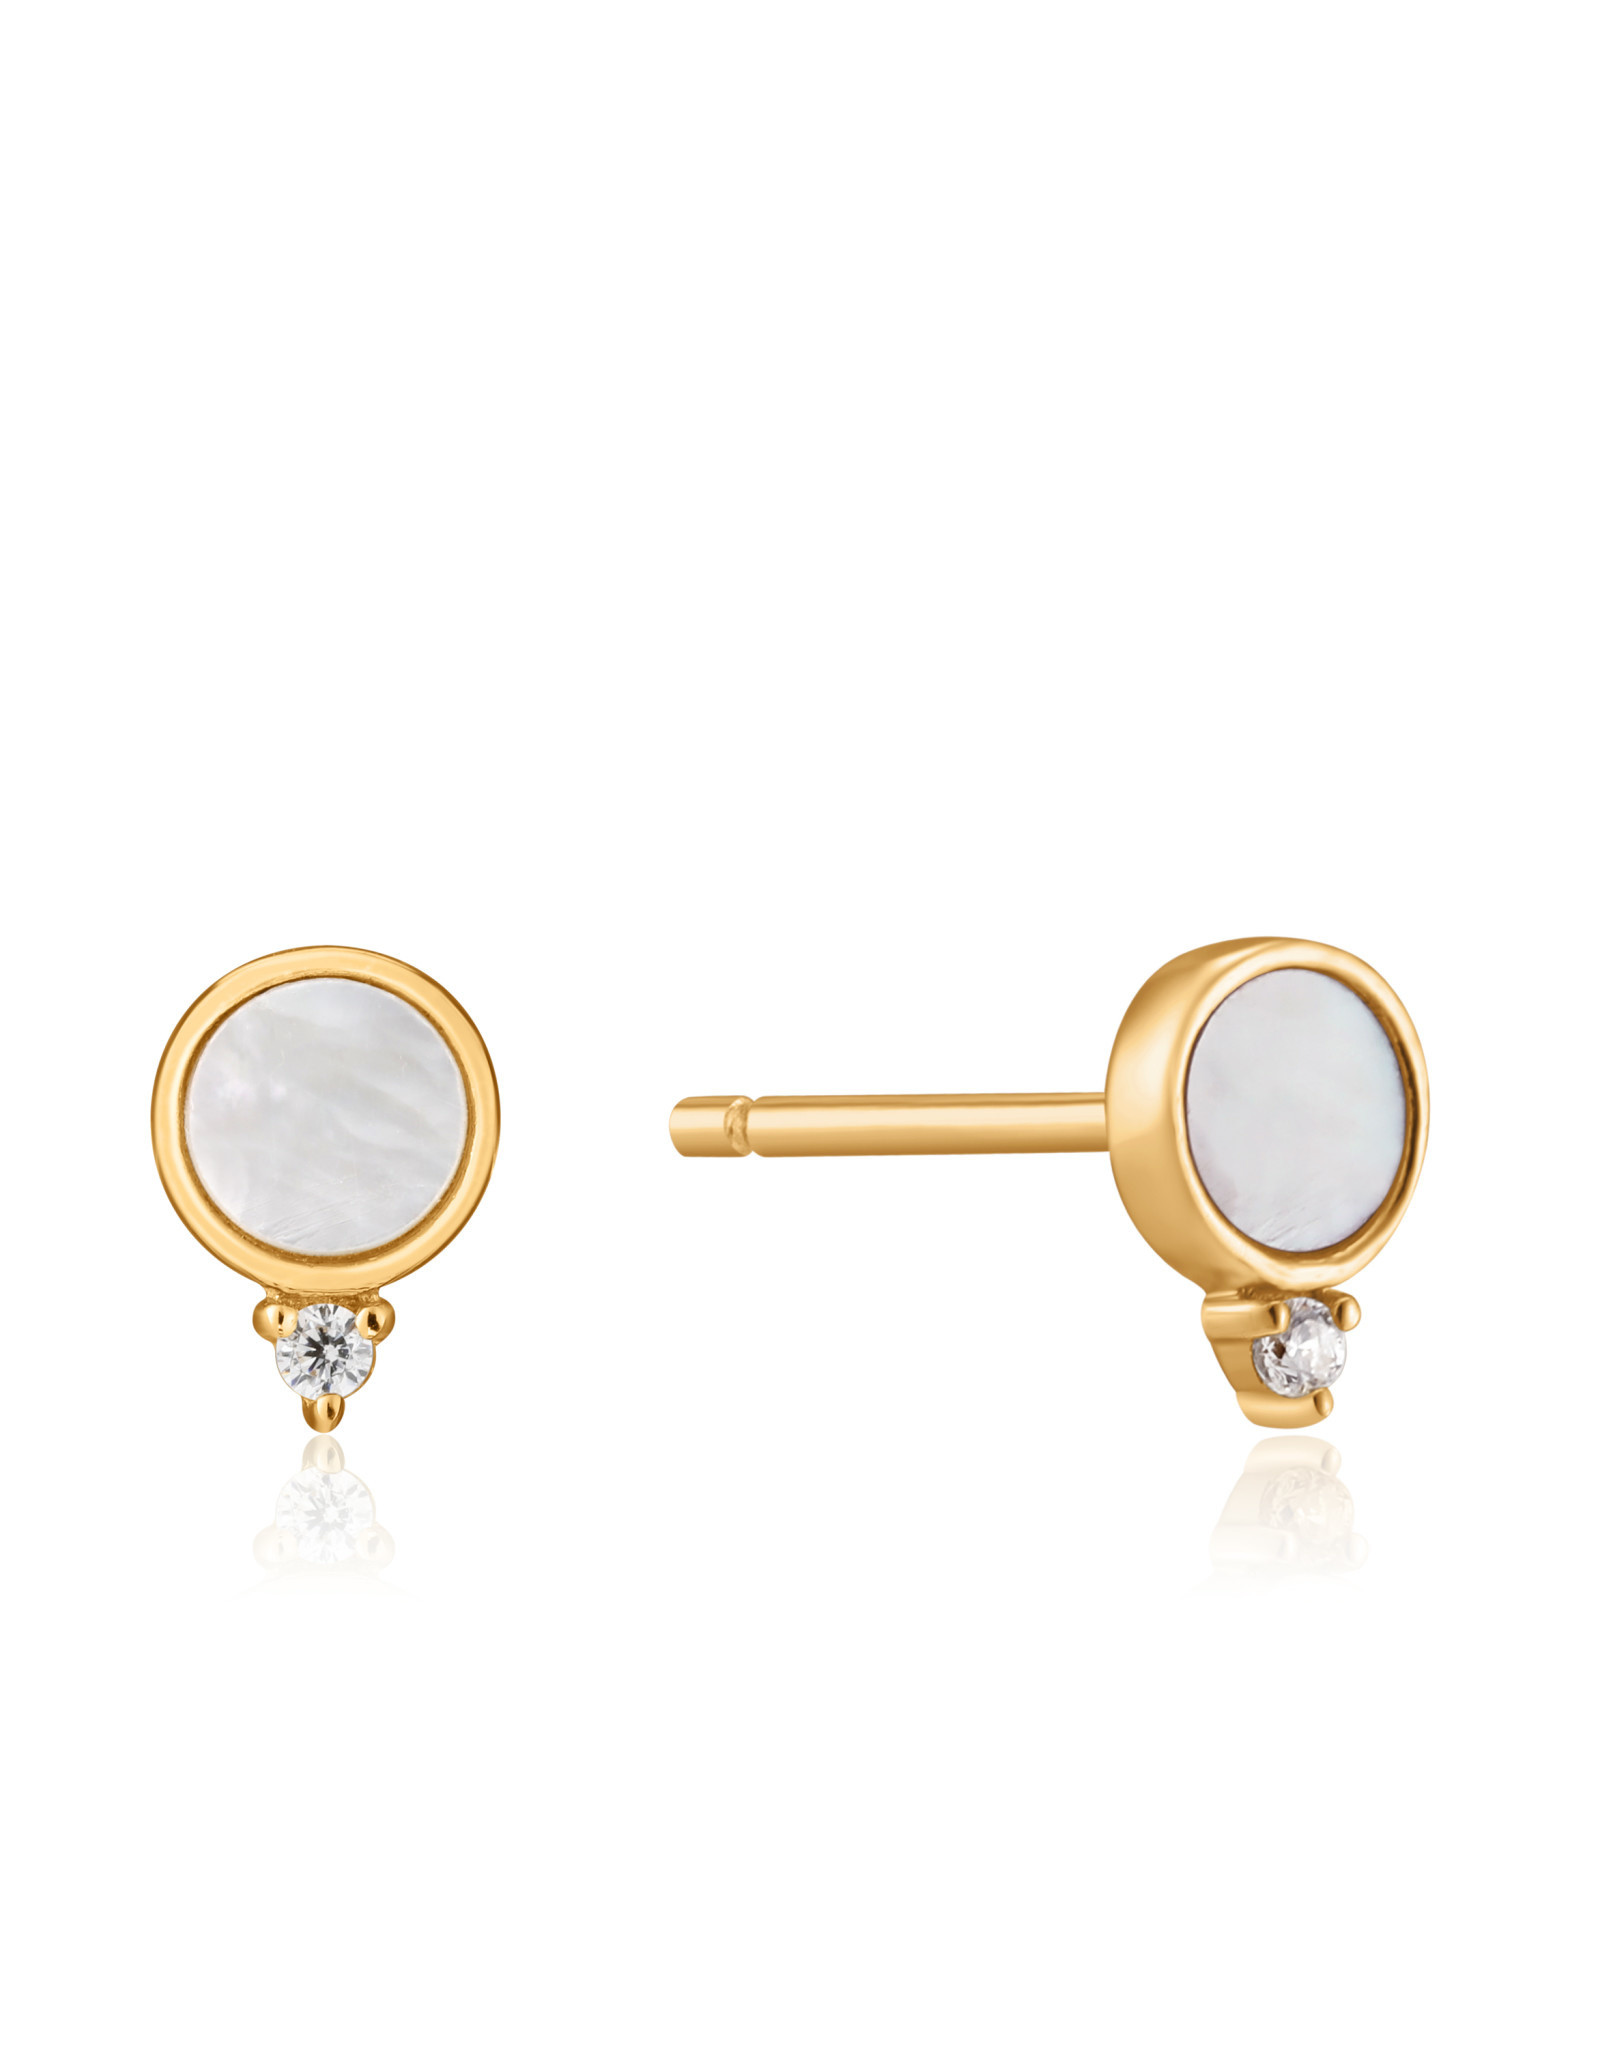 Ania Haie Ania Haie - Mother of pearl stud earrings